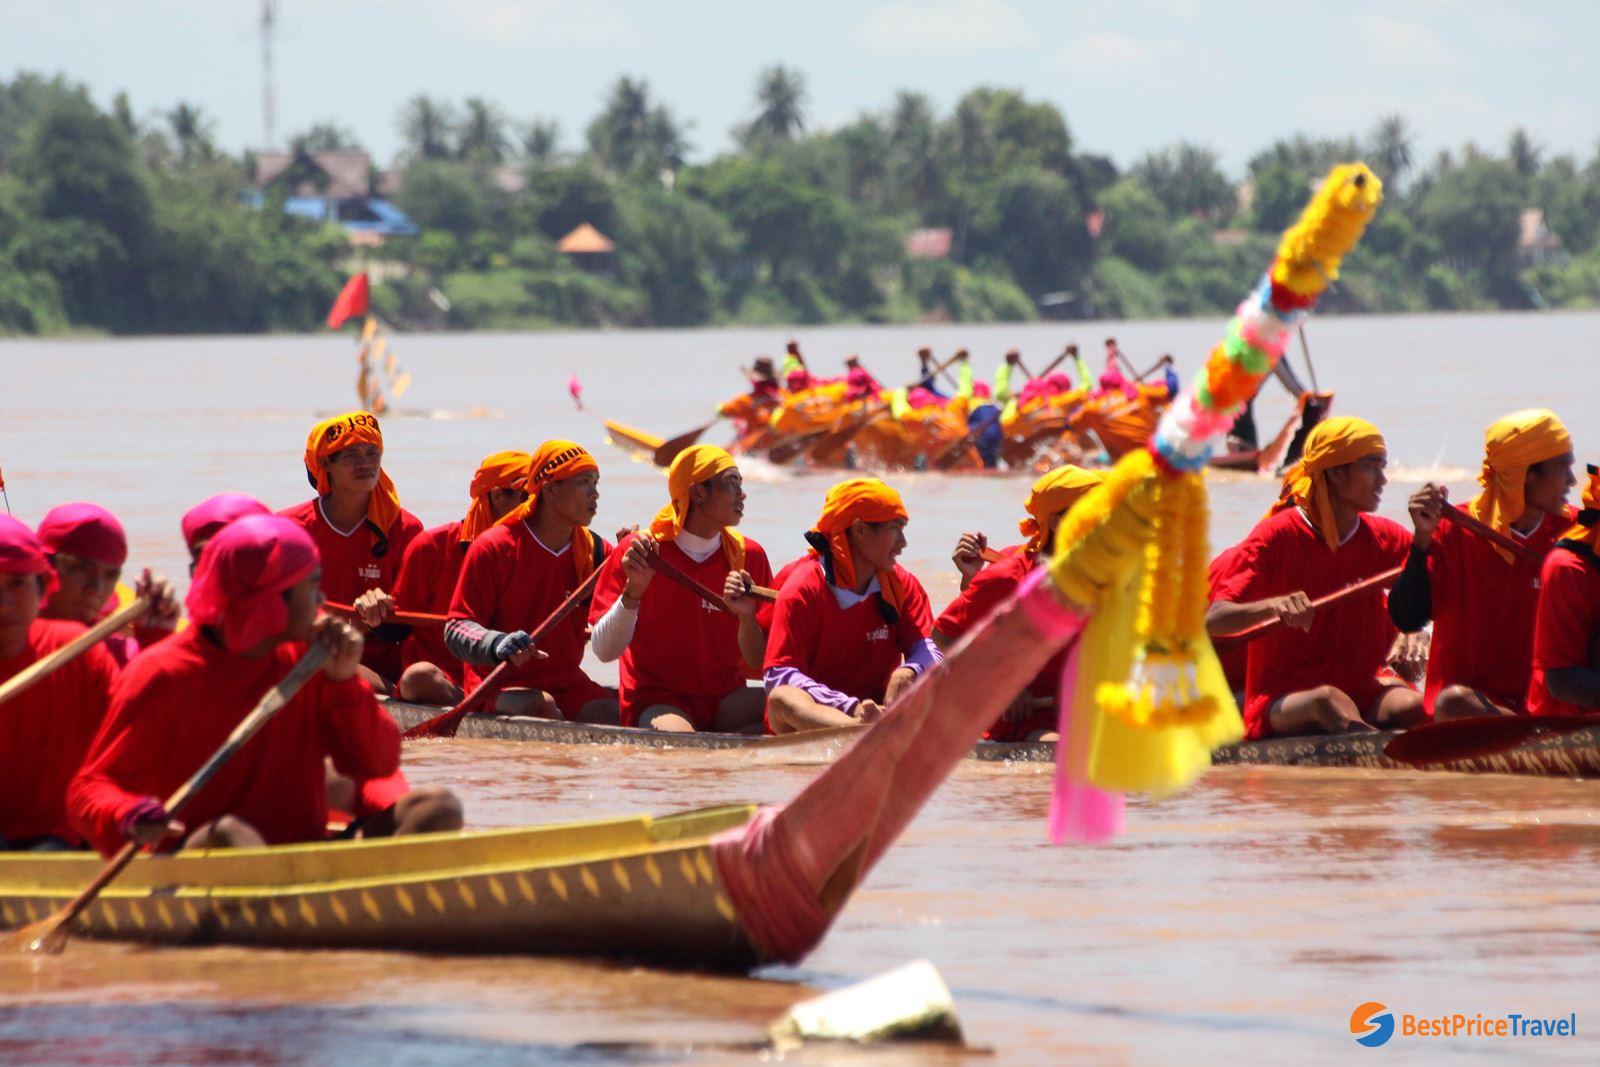 Boat racing in Awk Phansa Festival